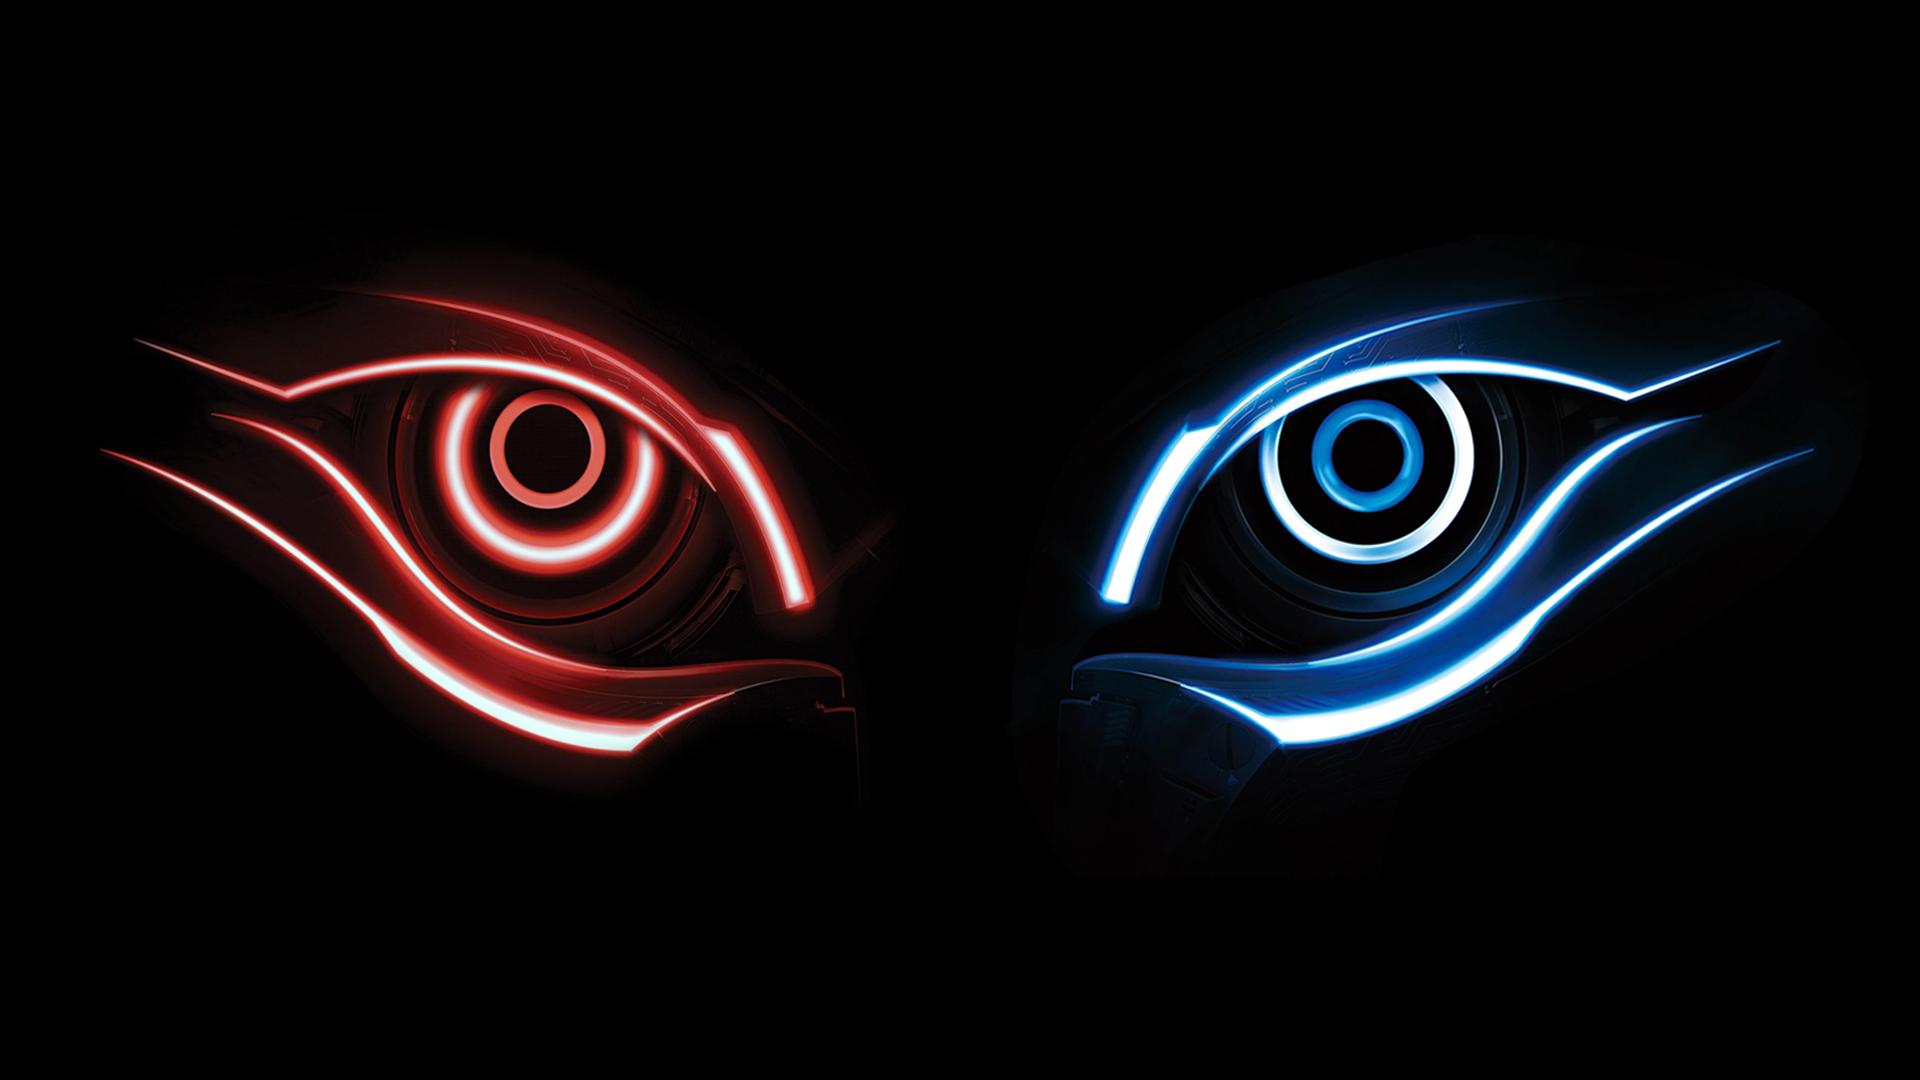 steam ワークショップ gigabyte logo 1920 x 1080 blue eye red eye